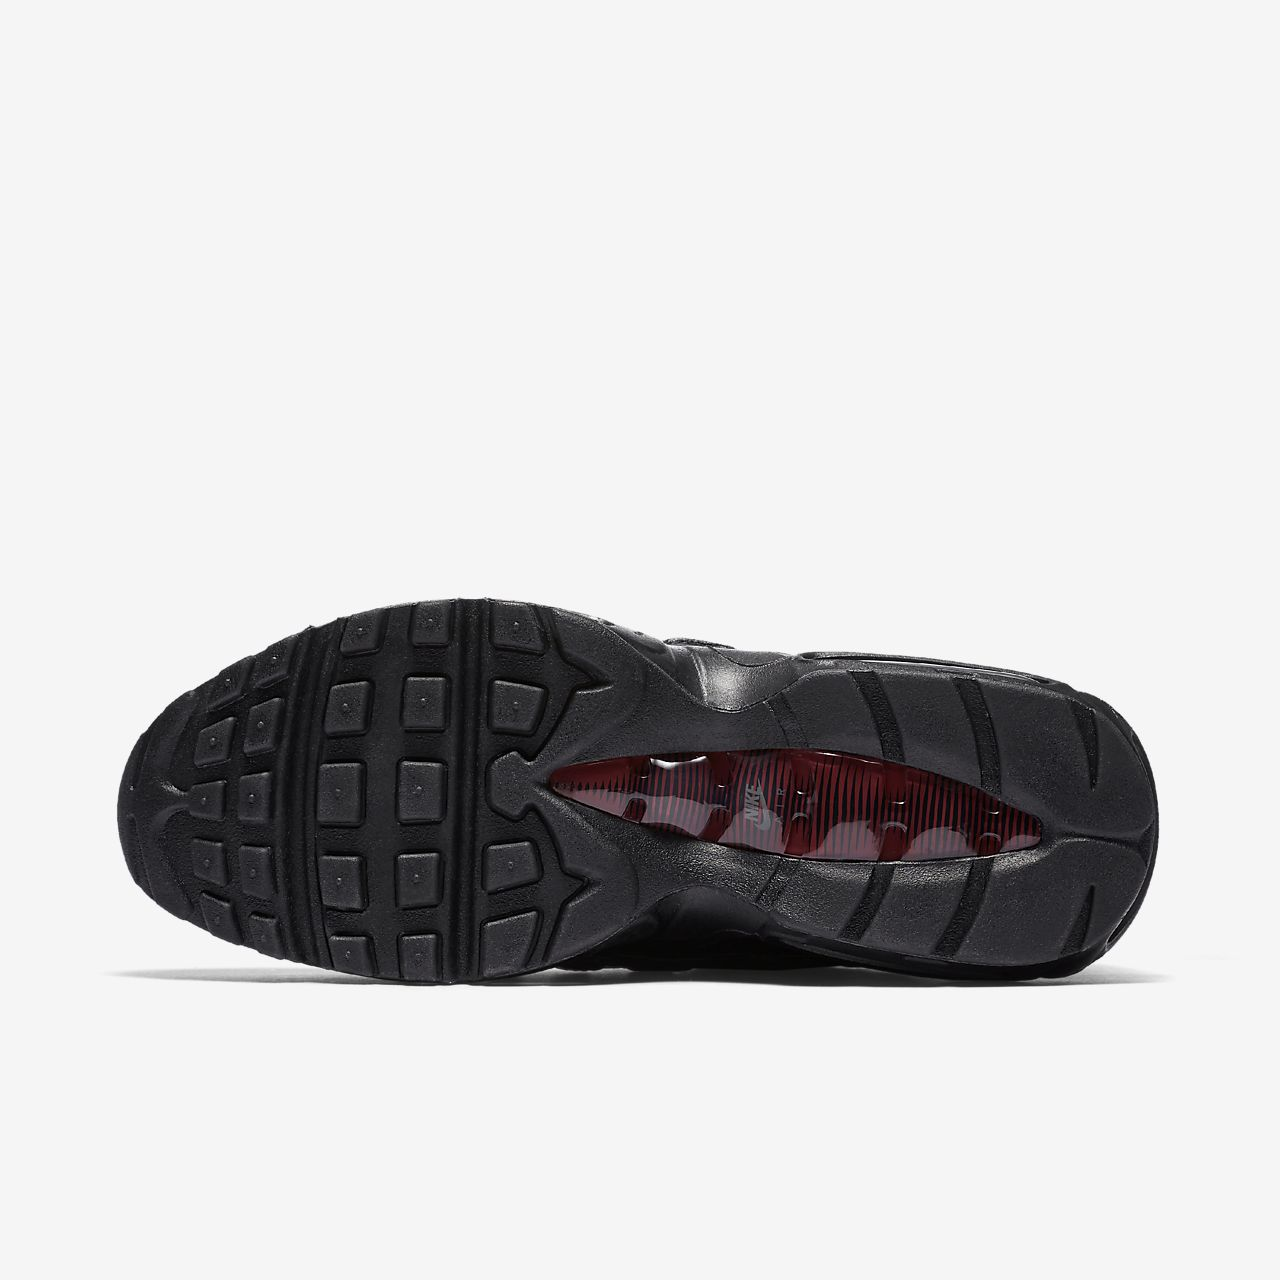 official photos 461d6 0fe18 ... Nike Air Max 95 NRG Men s Shoe